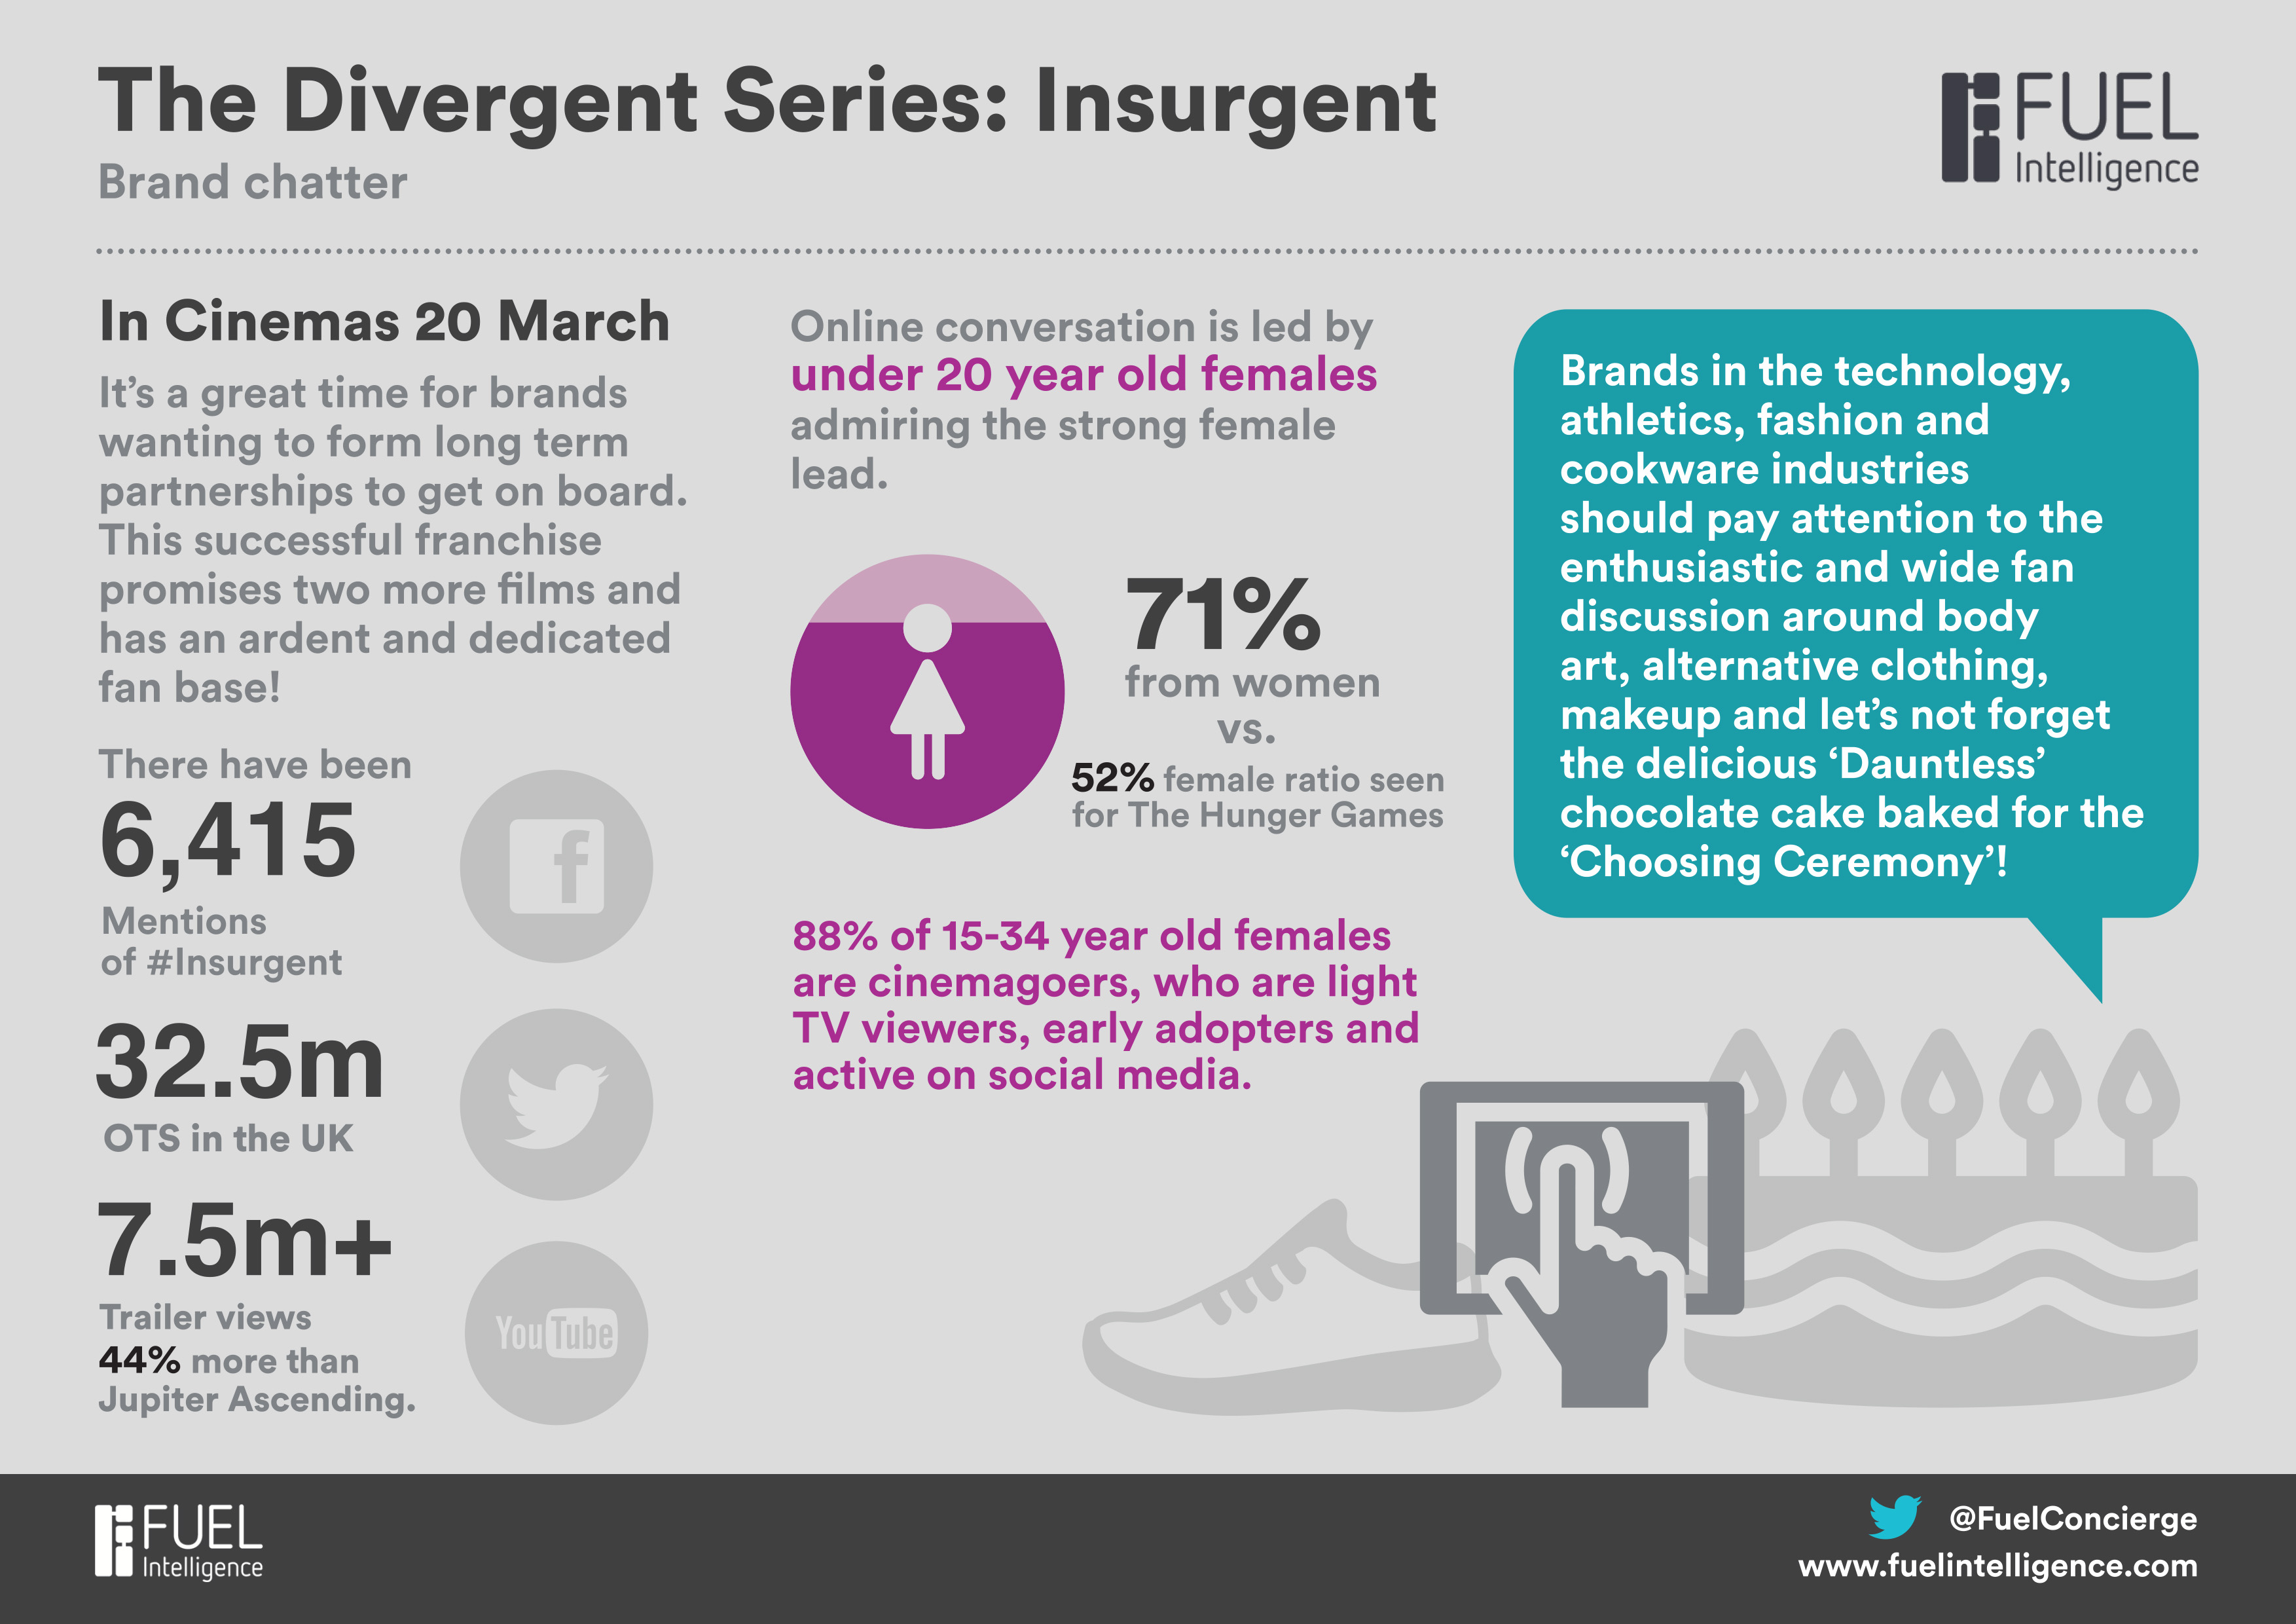 The Divergent Series: Insurgent – analysing the brand